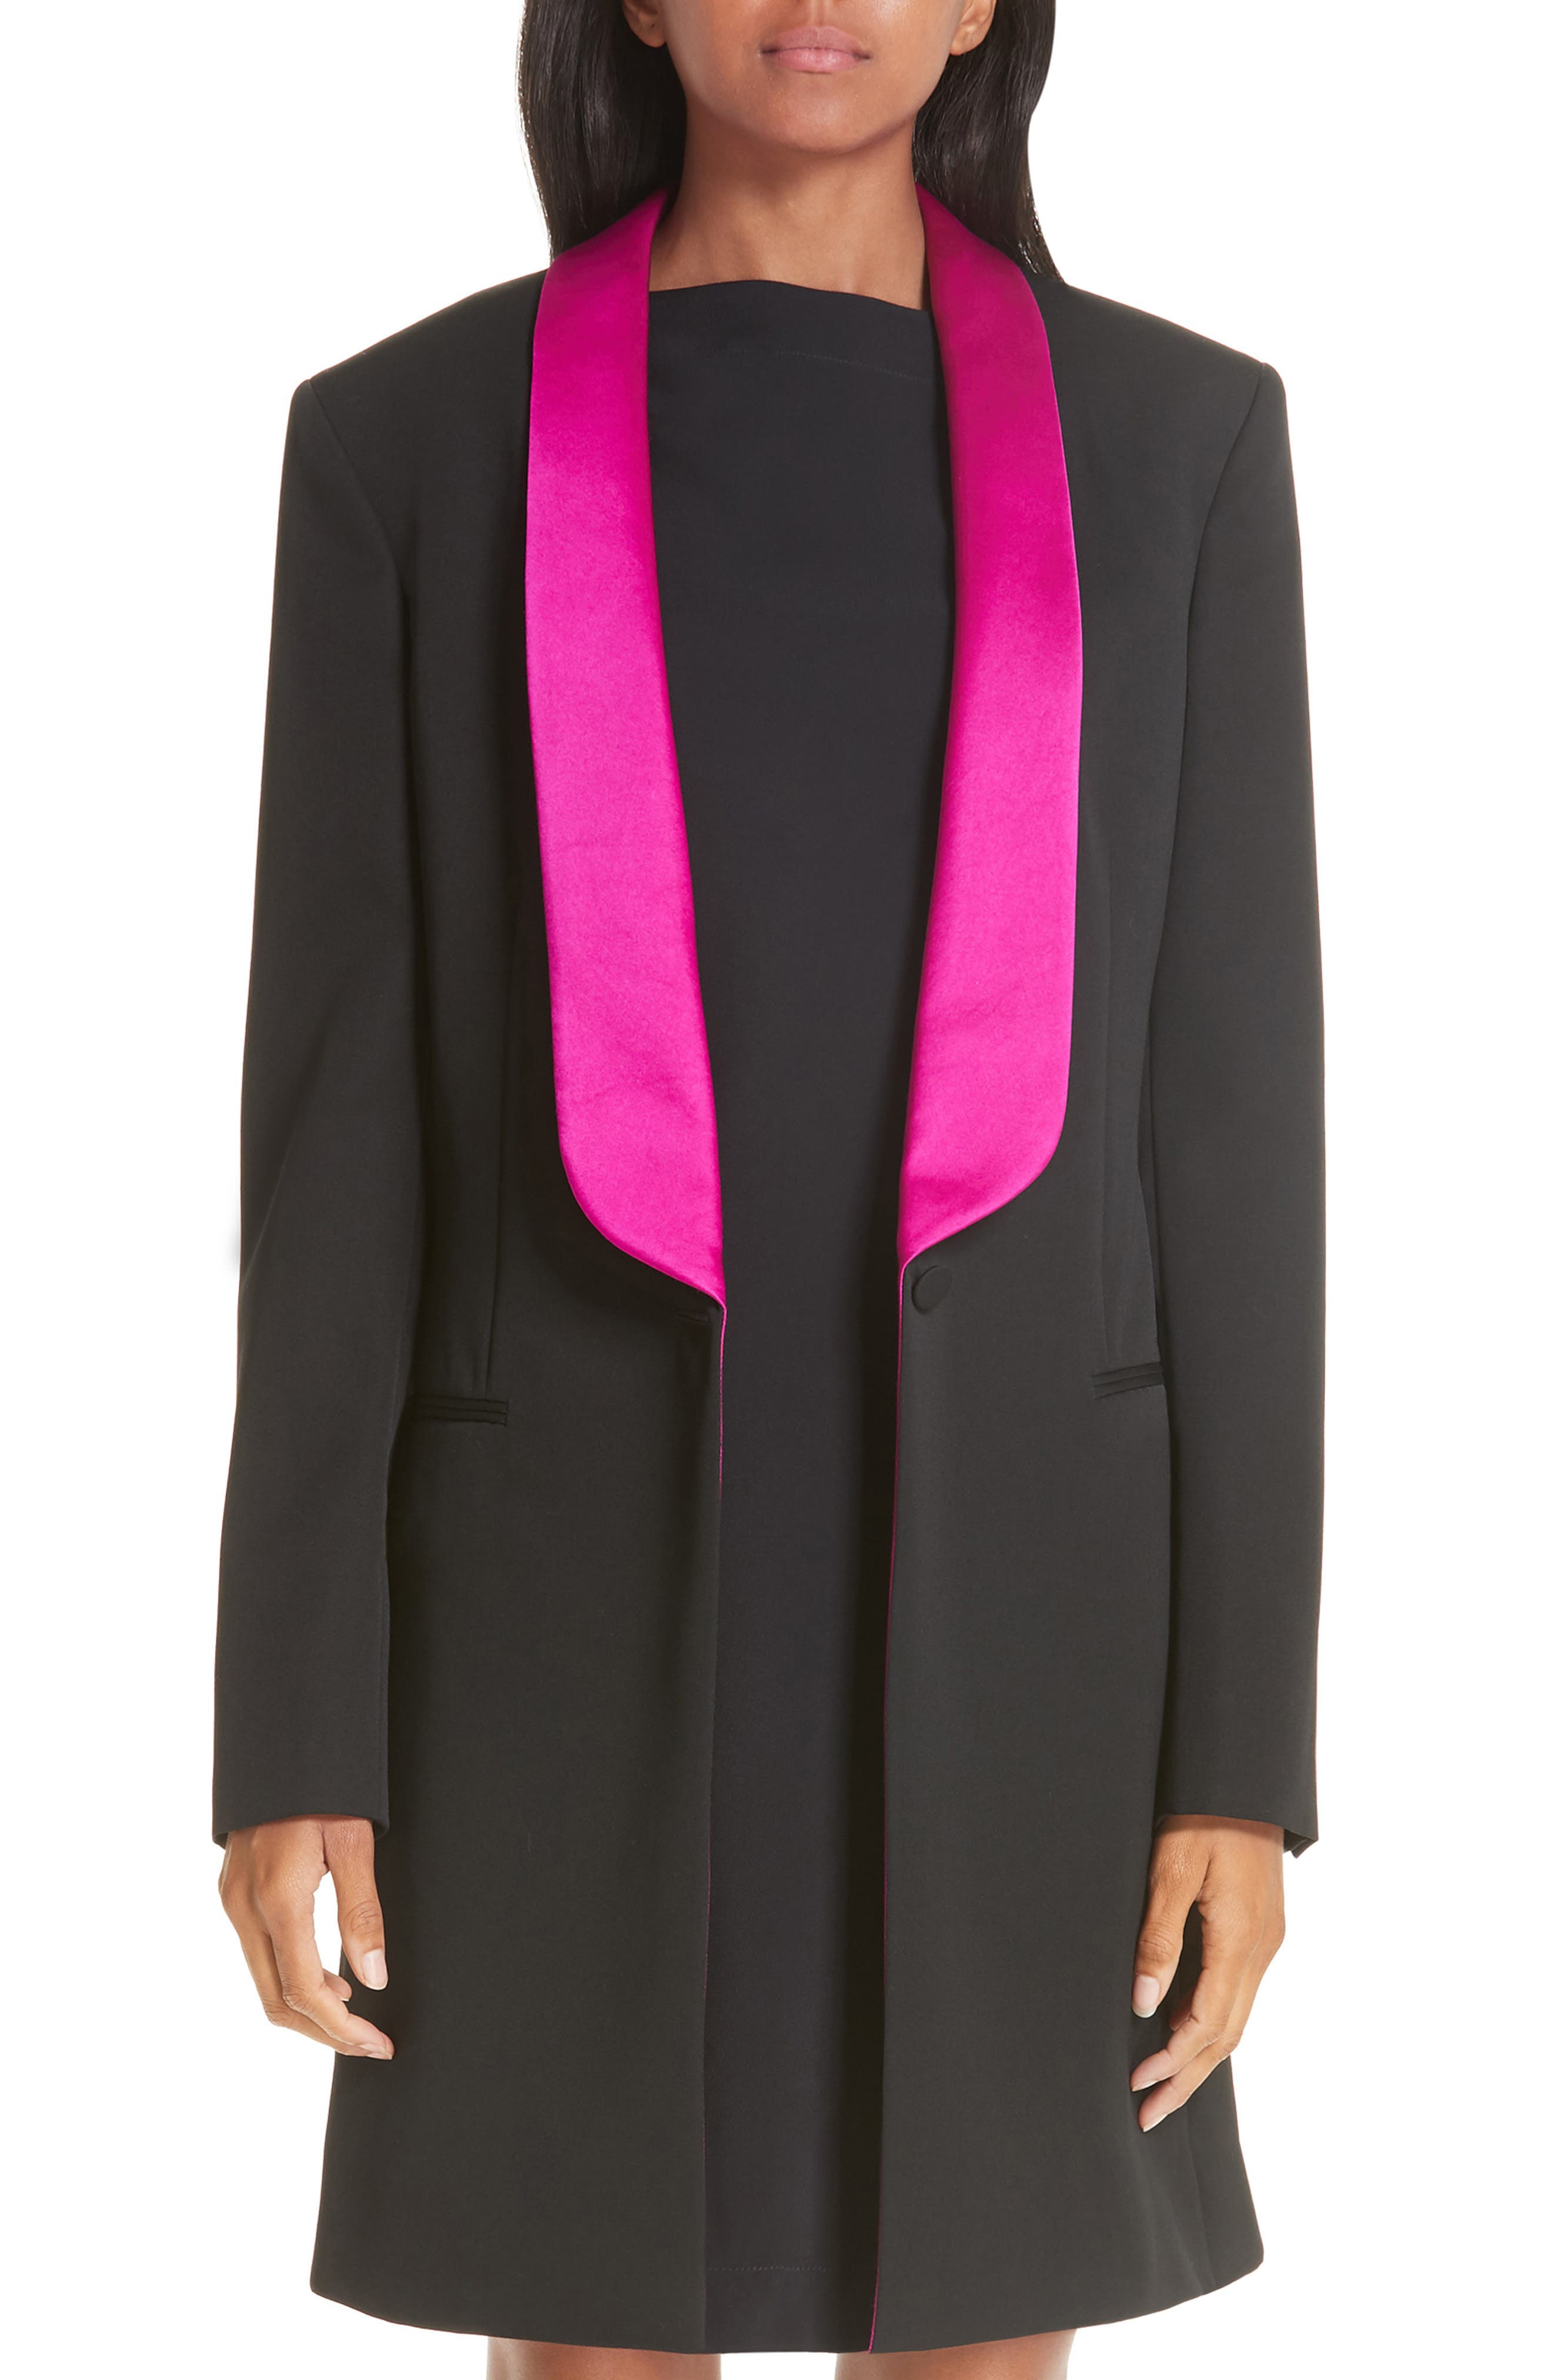 CALVIN KLEIN 205W39NYC, Contrast Lapel Wool Gabardine Jacket, Main thumbnail 1, color, BLACK DARK ORCHID